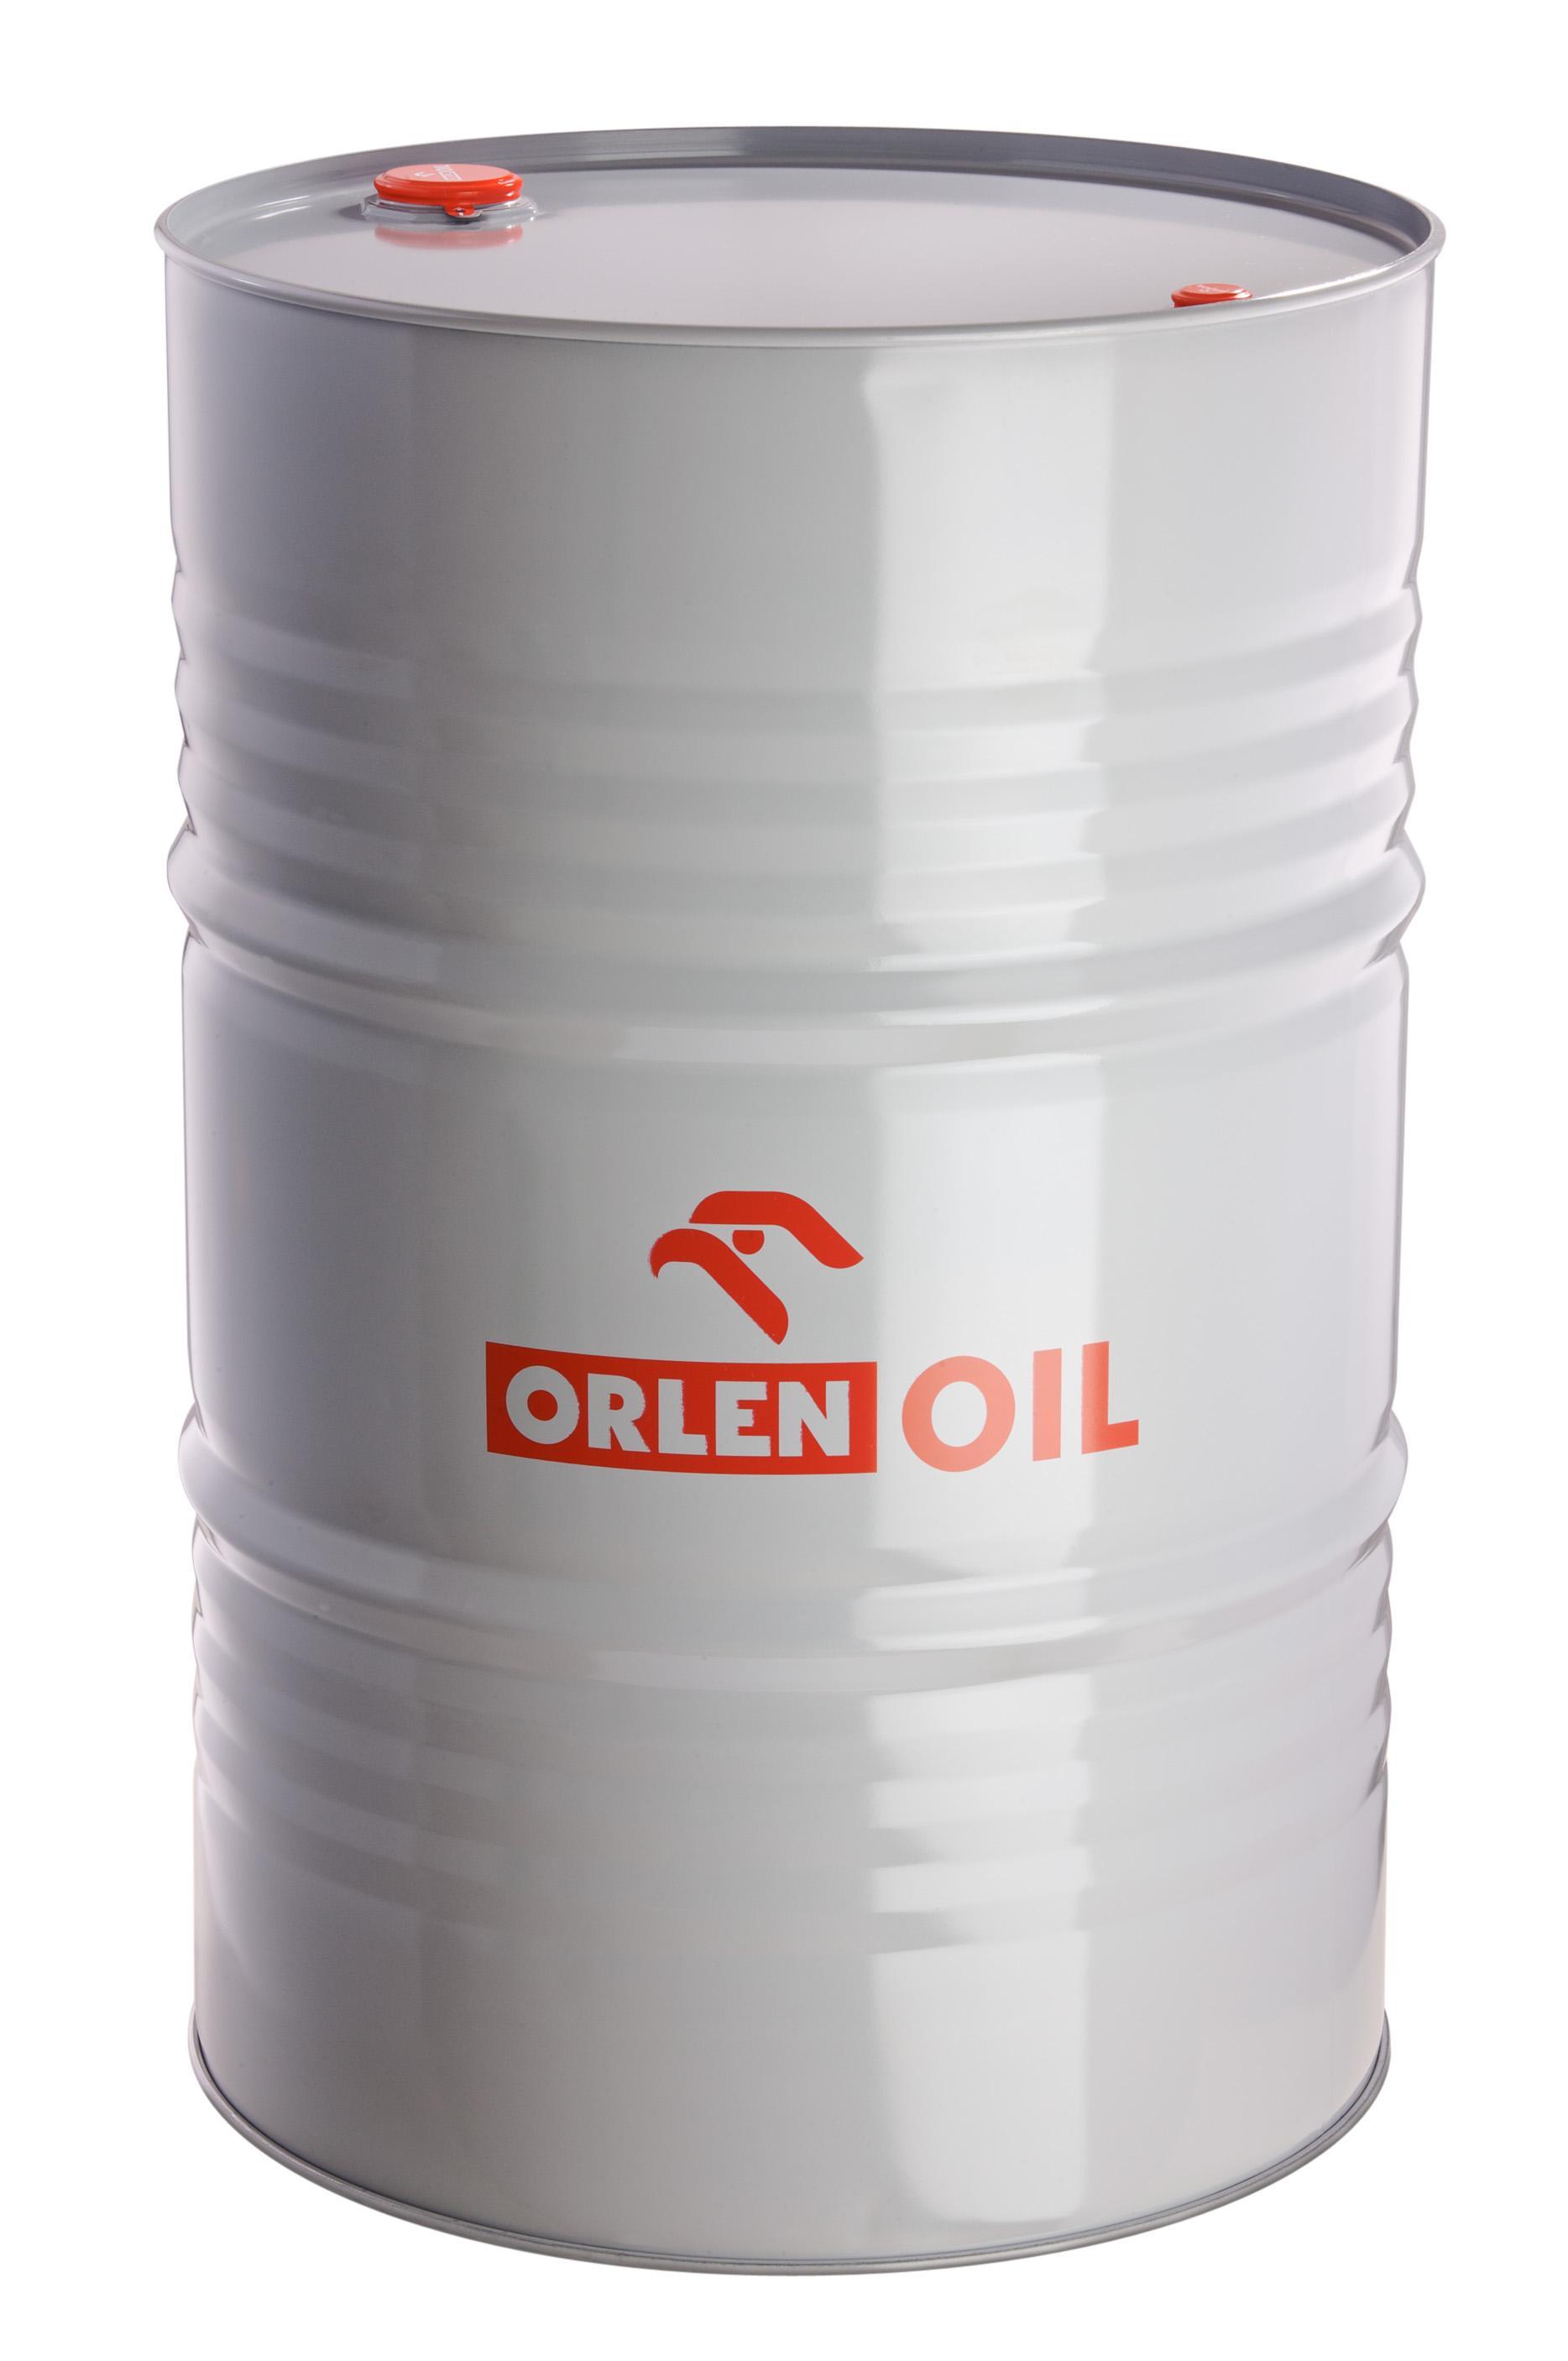 ORLEN OIL MASZYNOWY 2    DRUMS 180KG